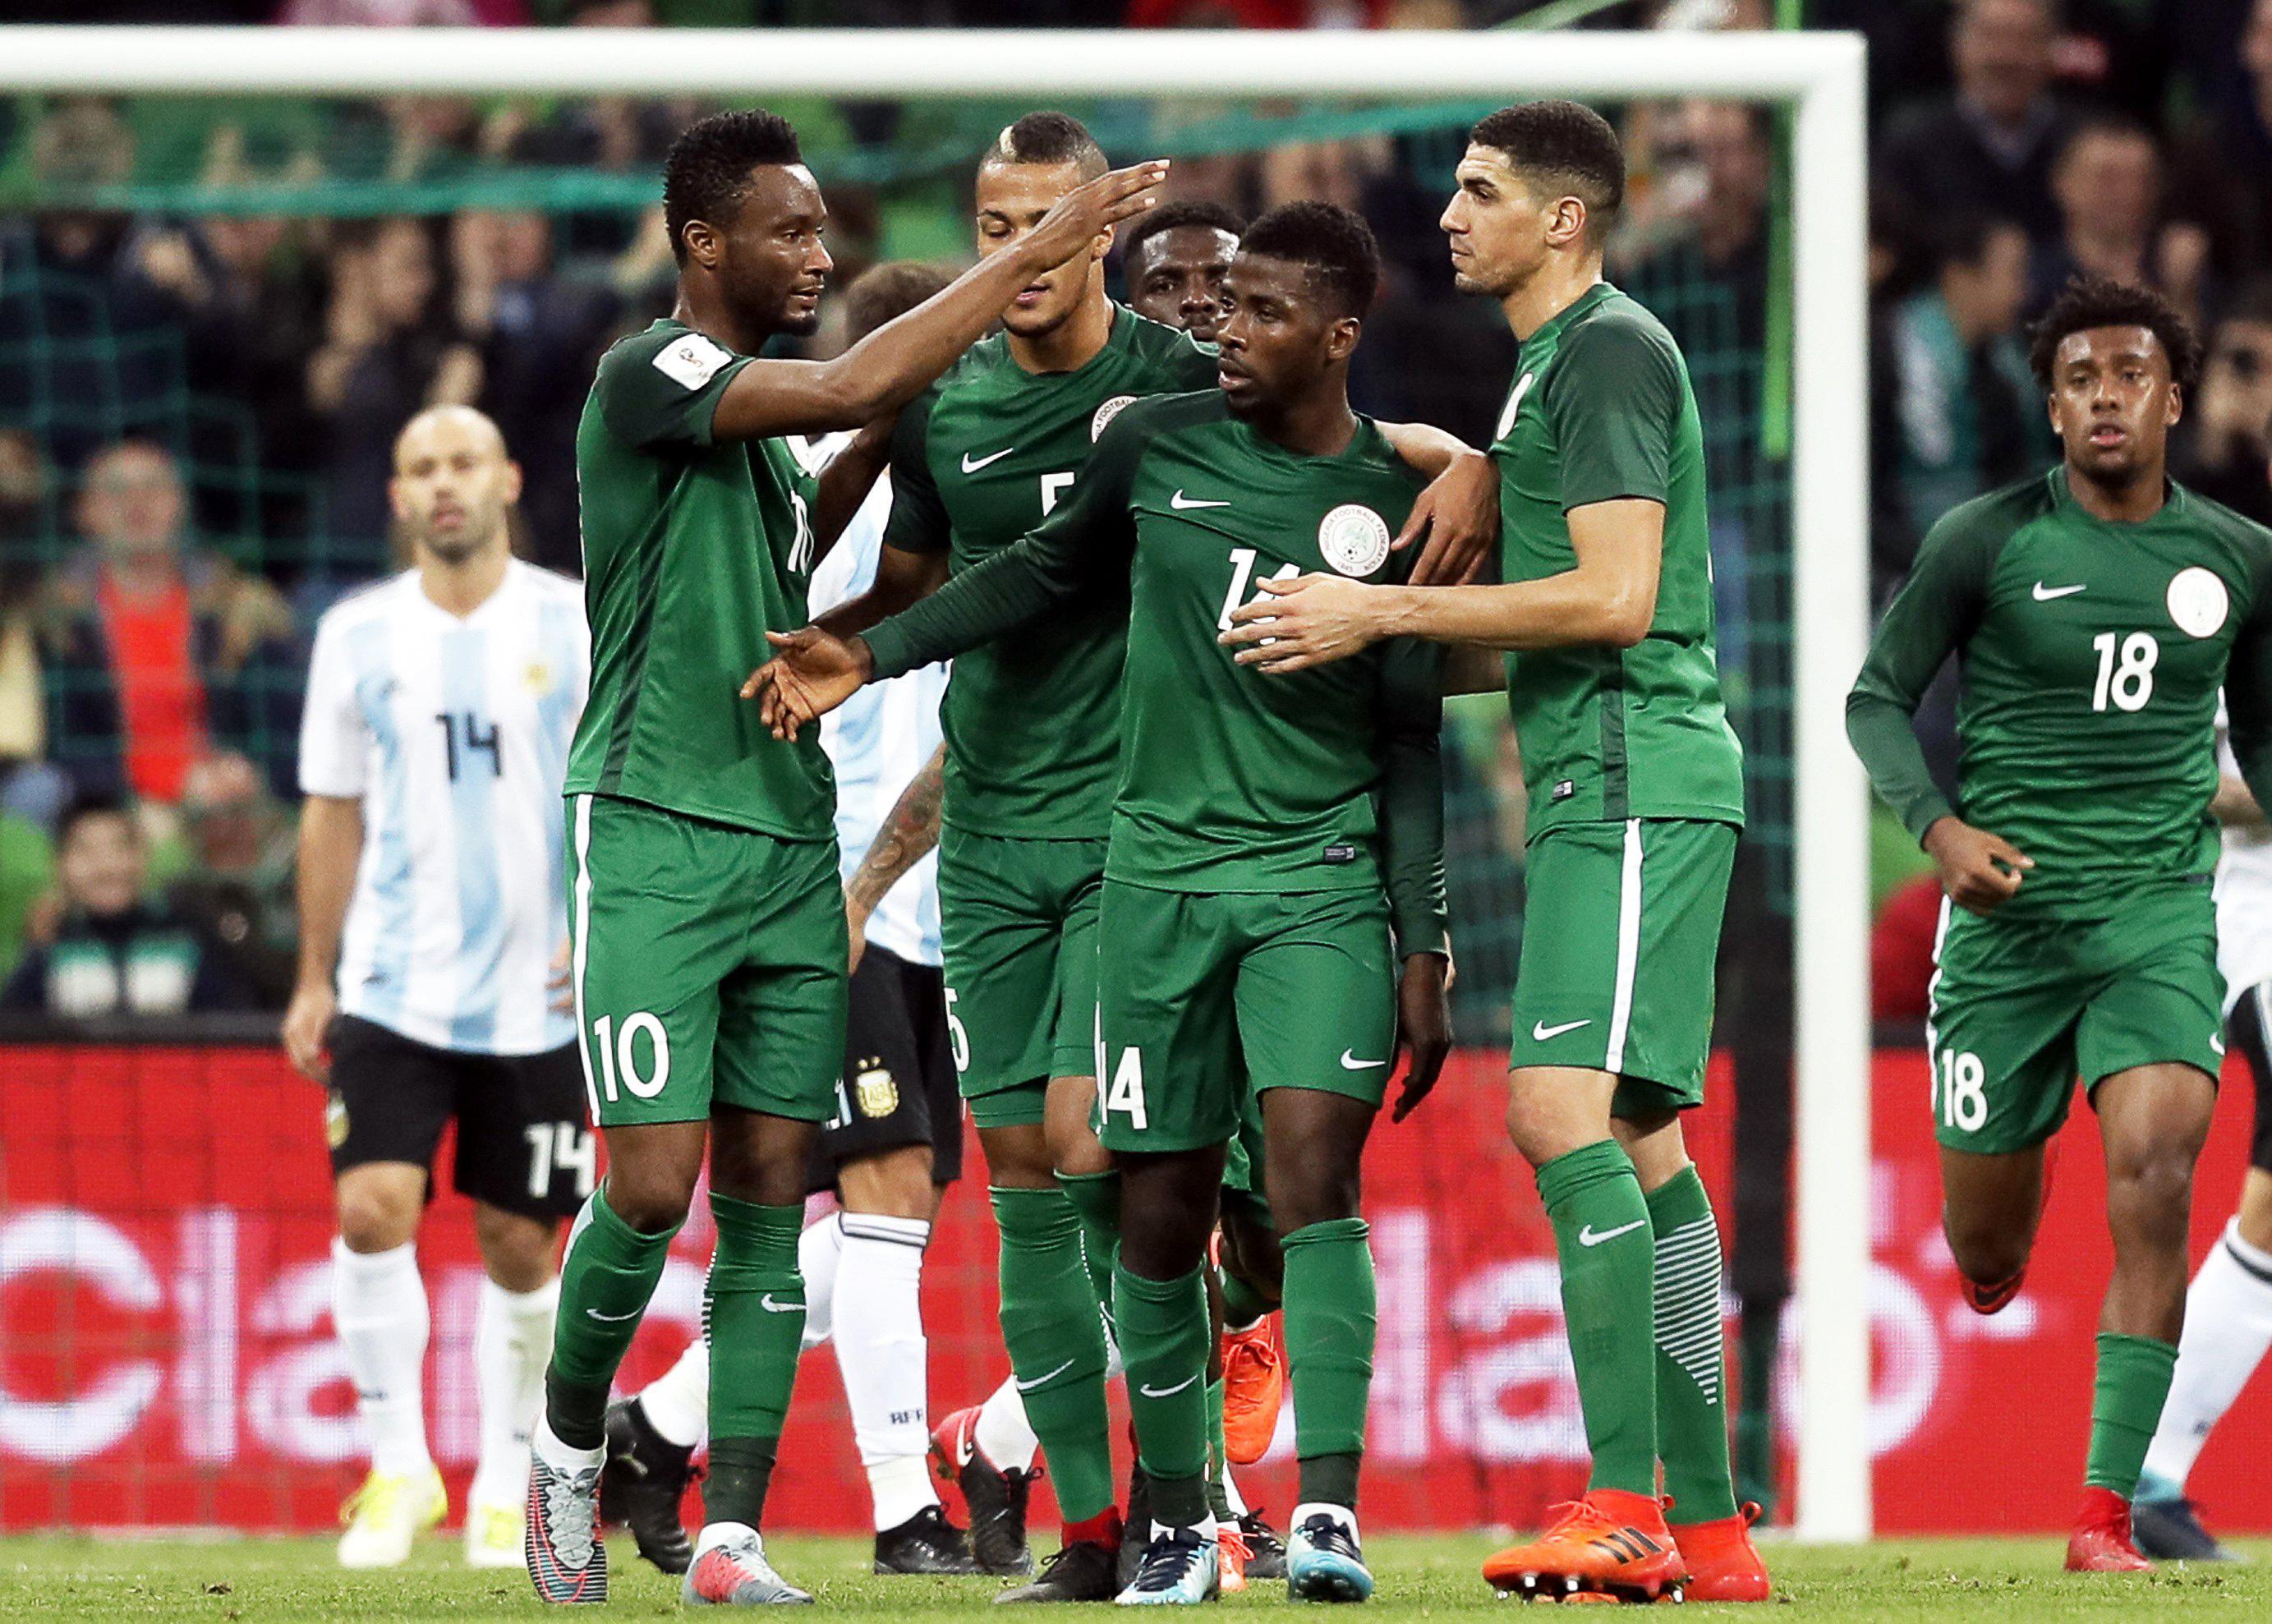 Nigeria were seriously impressive